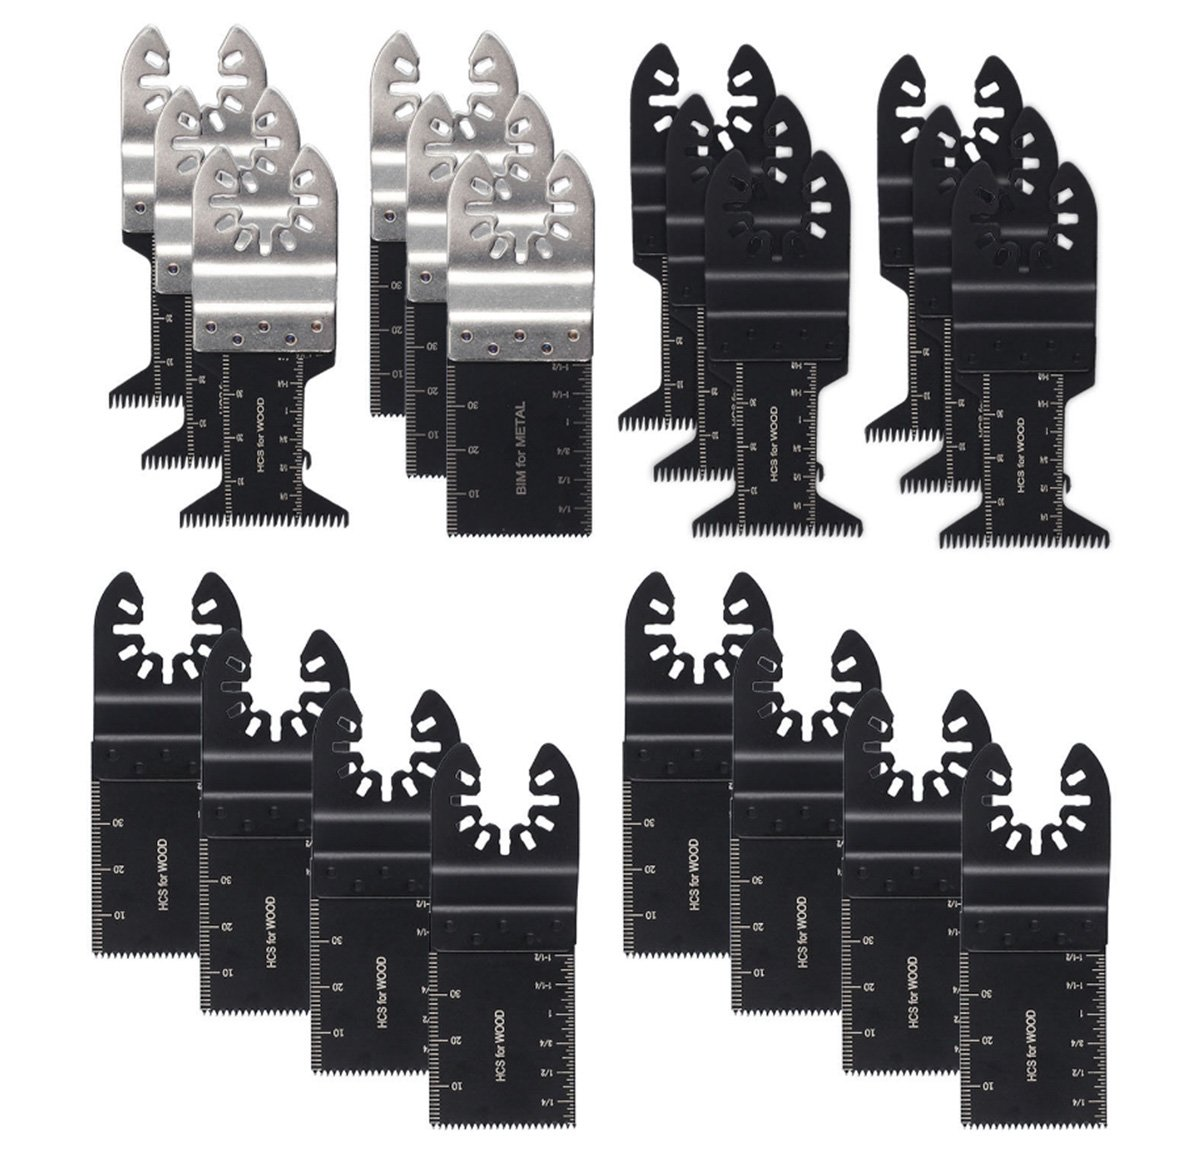 20 Mix Metal/wood Quick Release Oscillating Multitool Saw Blades Kit Fit Bi-Meta Blades Ideal for Fein Multimaster Porter Cable Black & Decker Bosch Ryobi Milwaukee Bosch Dremel Dewalt Rockwell Makita